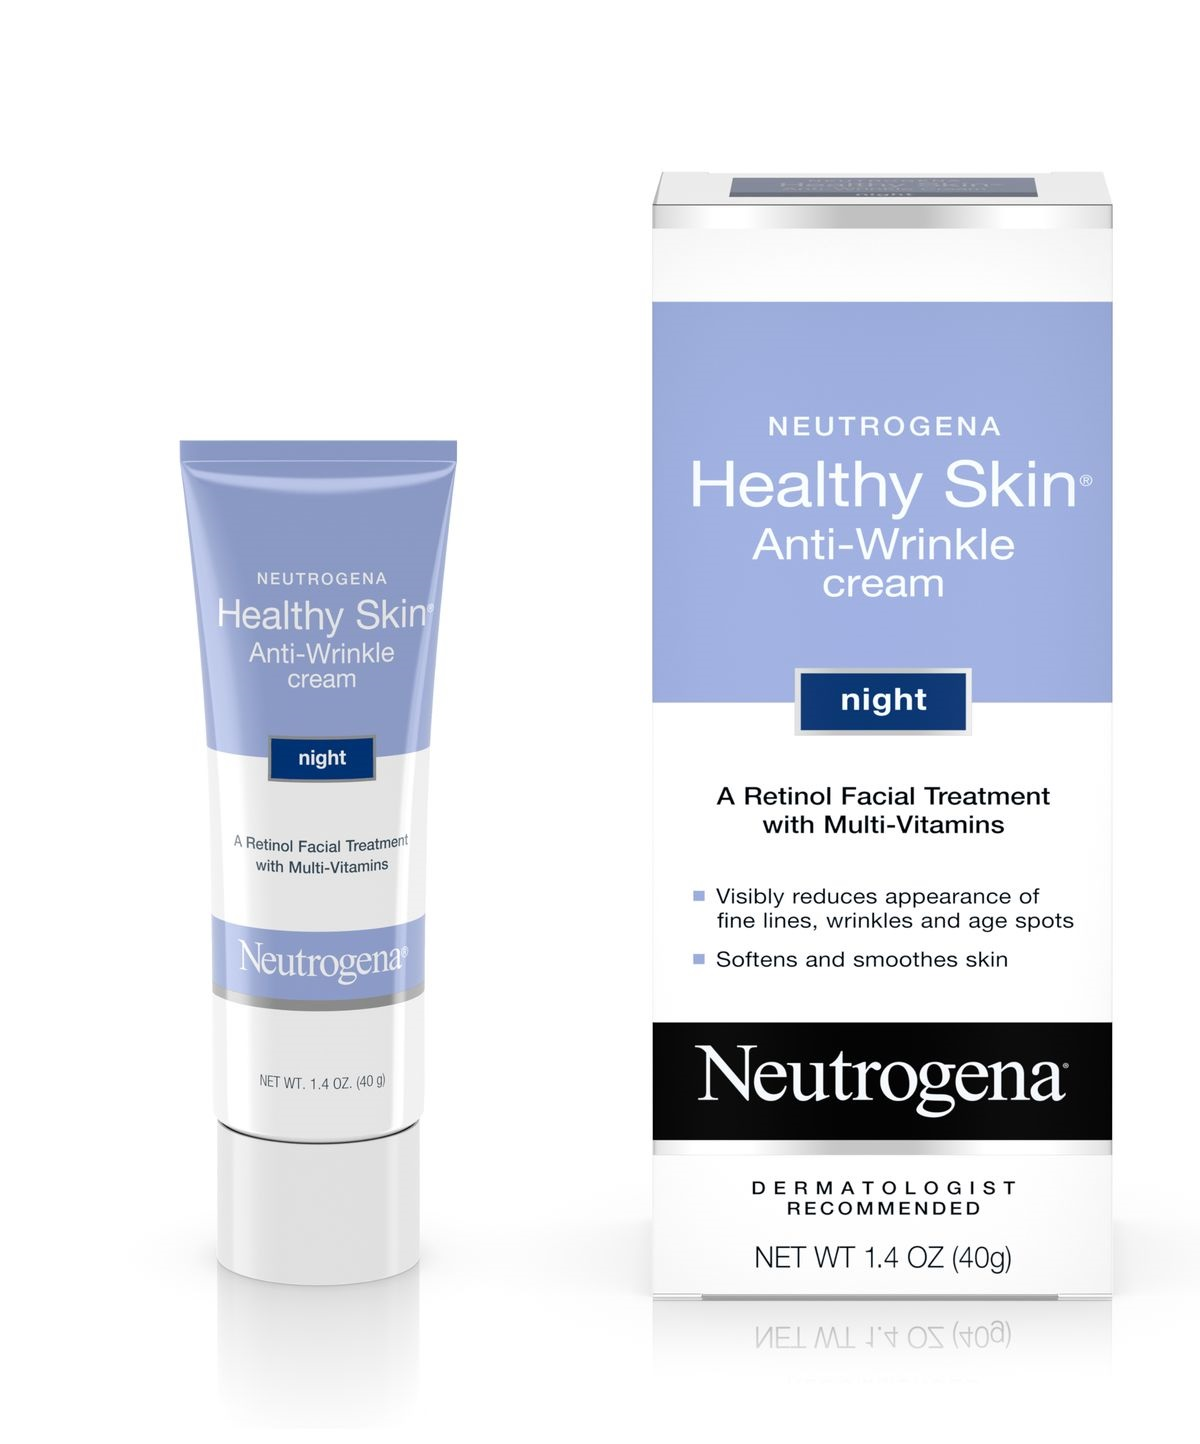 Neutrogena® Healthy Skin Anti-Wrinkle Night Cream